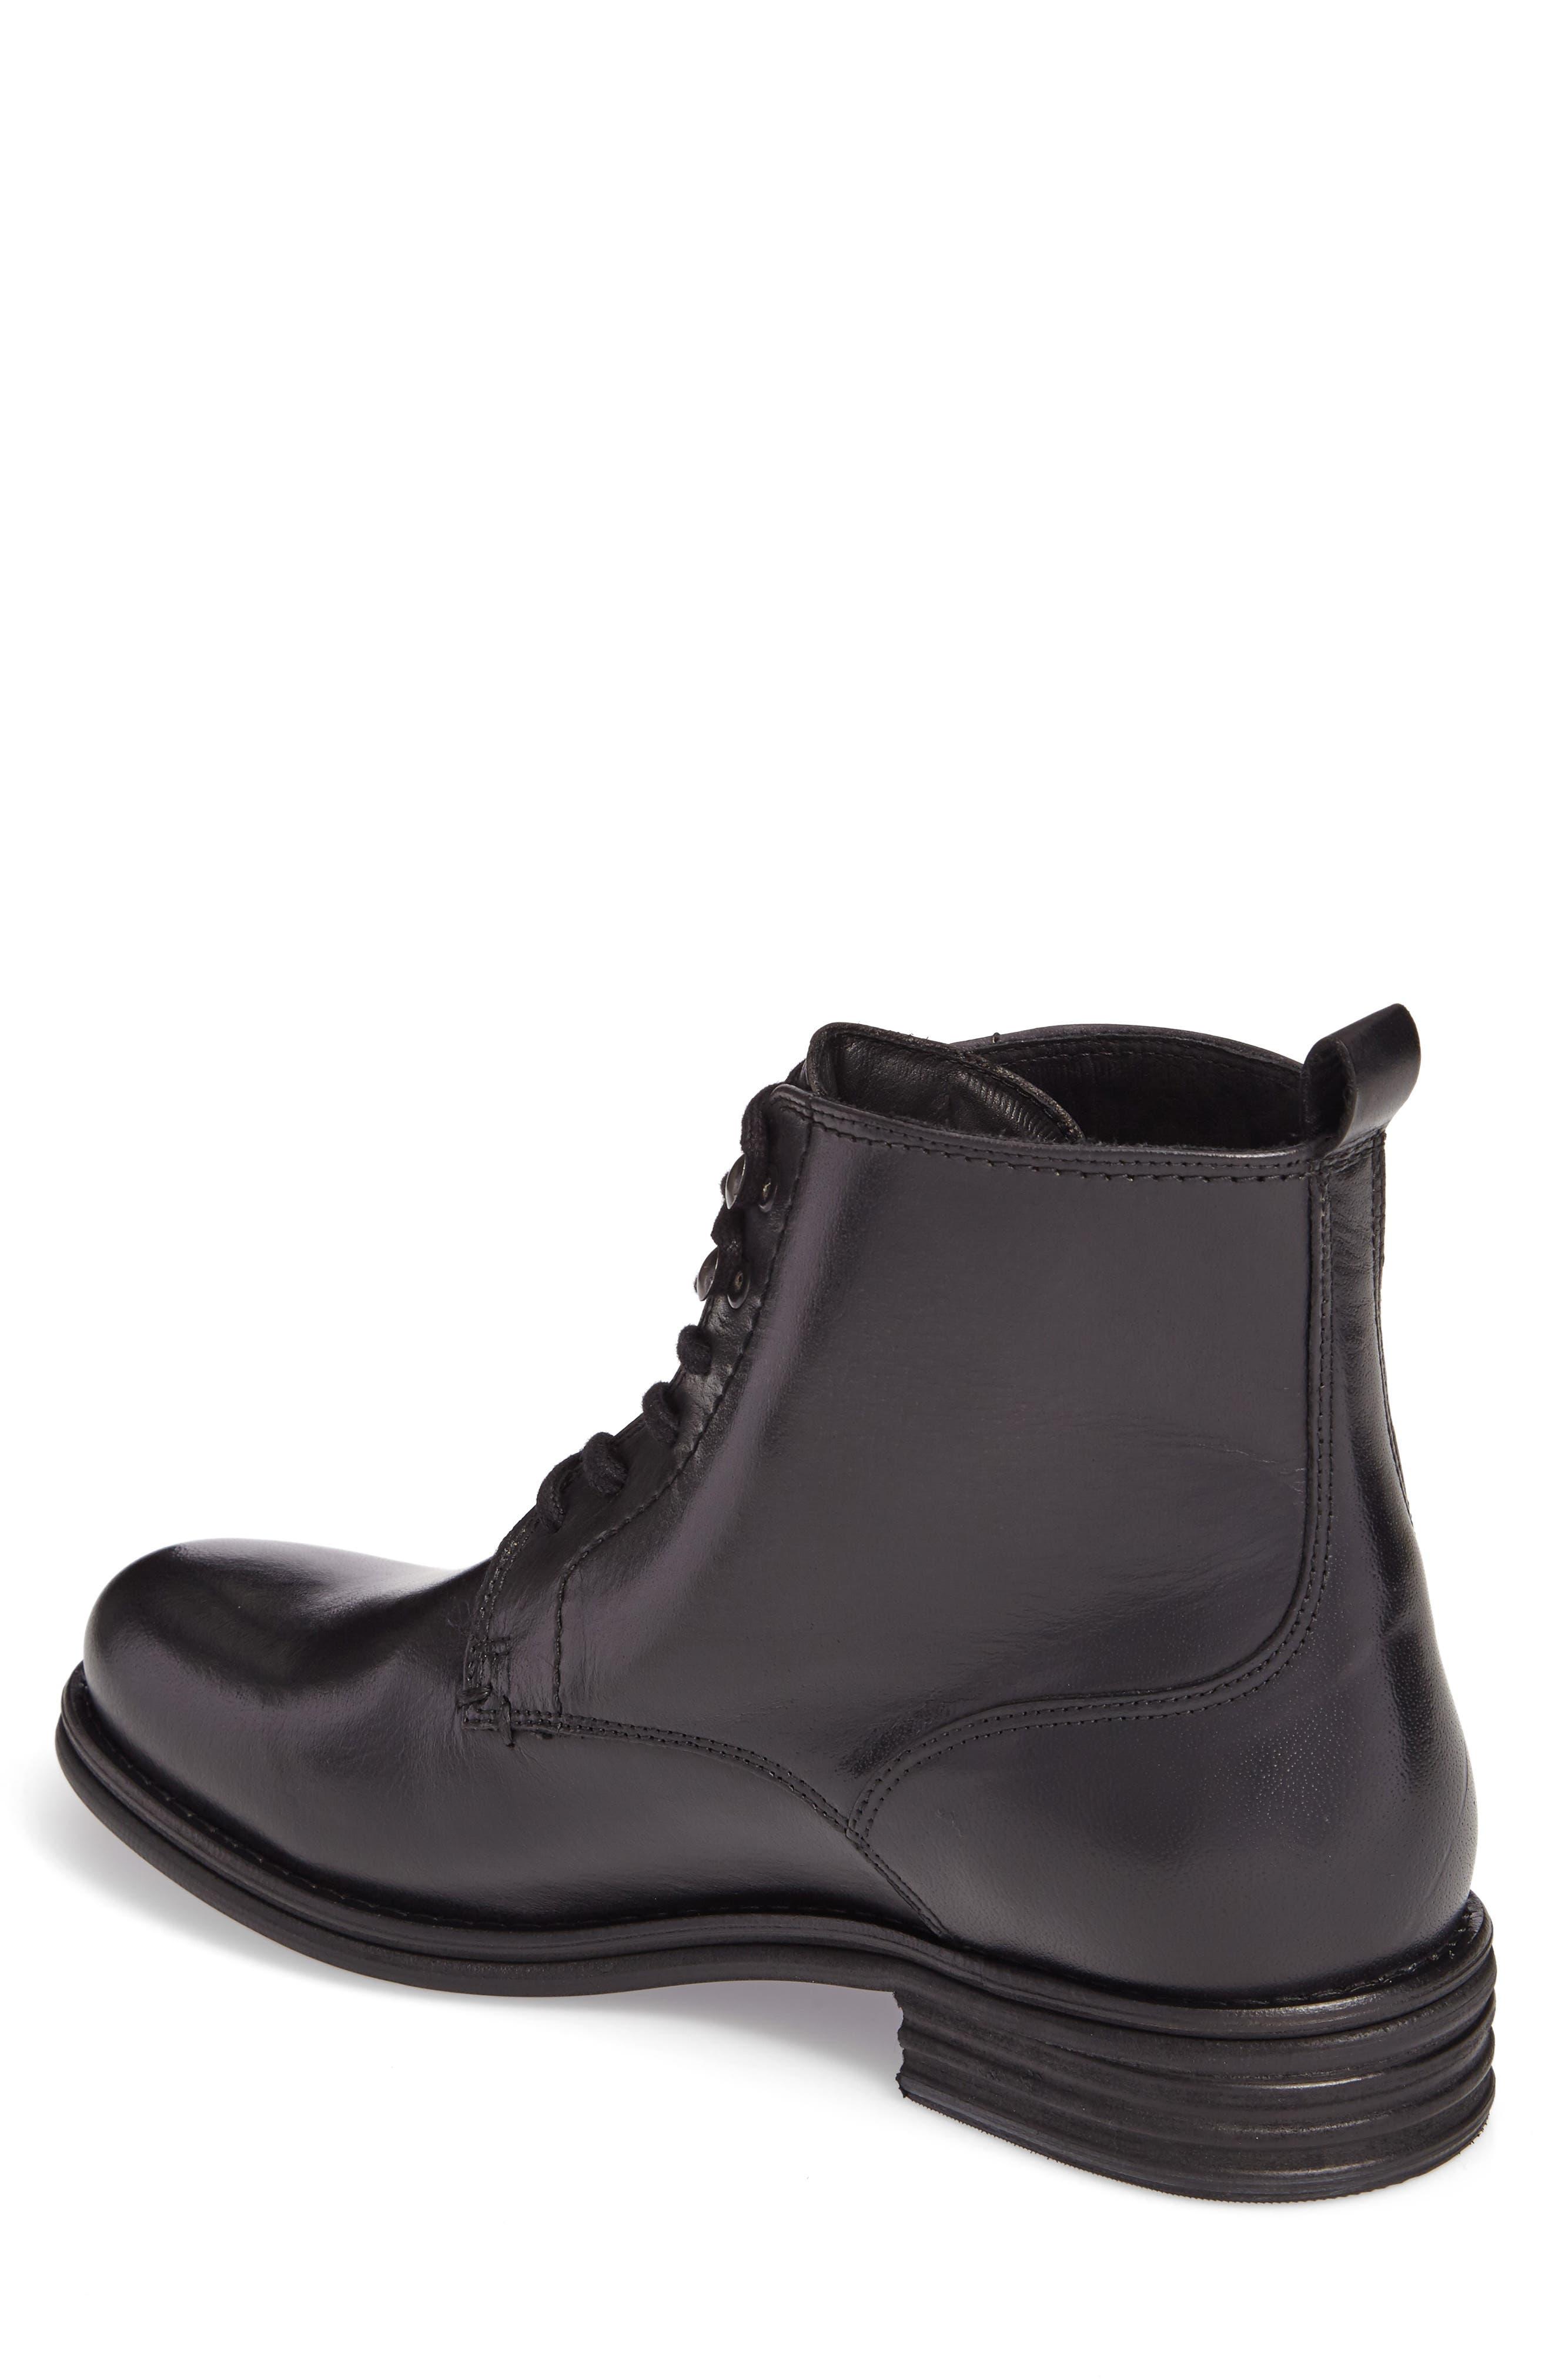 VINCE CAMUTO,                             Cordie Plain Toe Boot,                             Alternate thumbnail 2, color,                             001